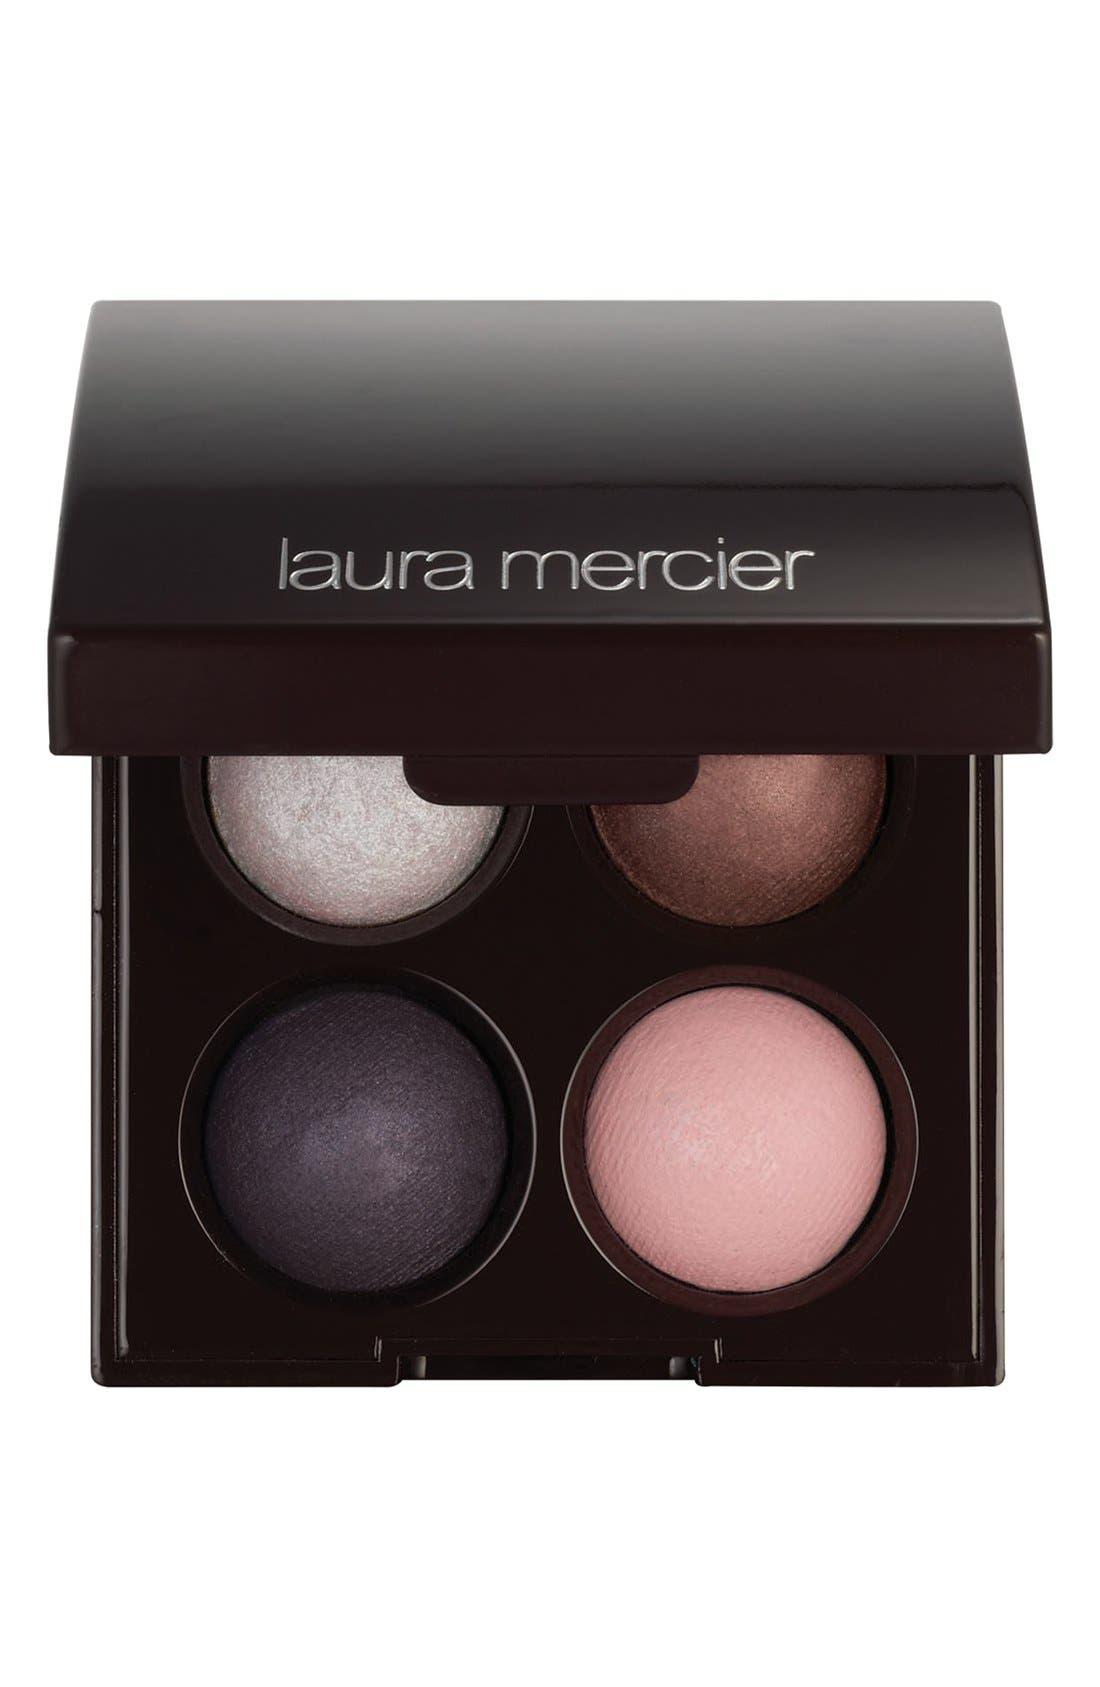 LAURA MERCIER, Baked Eyeshadow Quad, Main thumbnail 1, color, 960